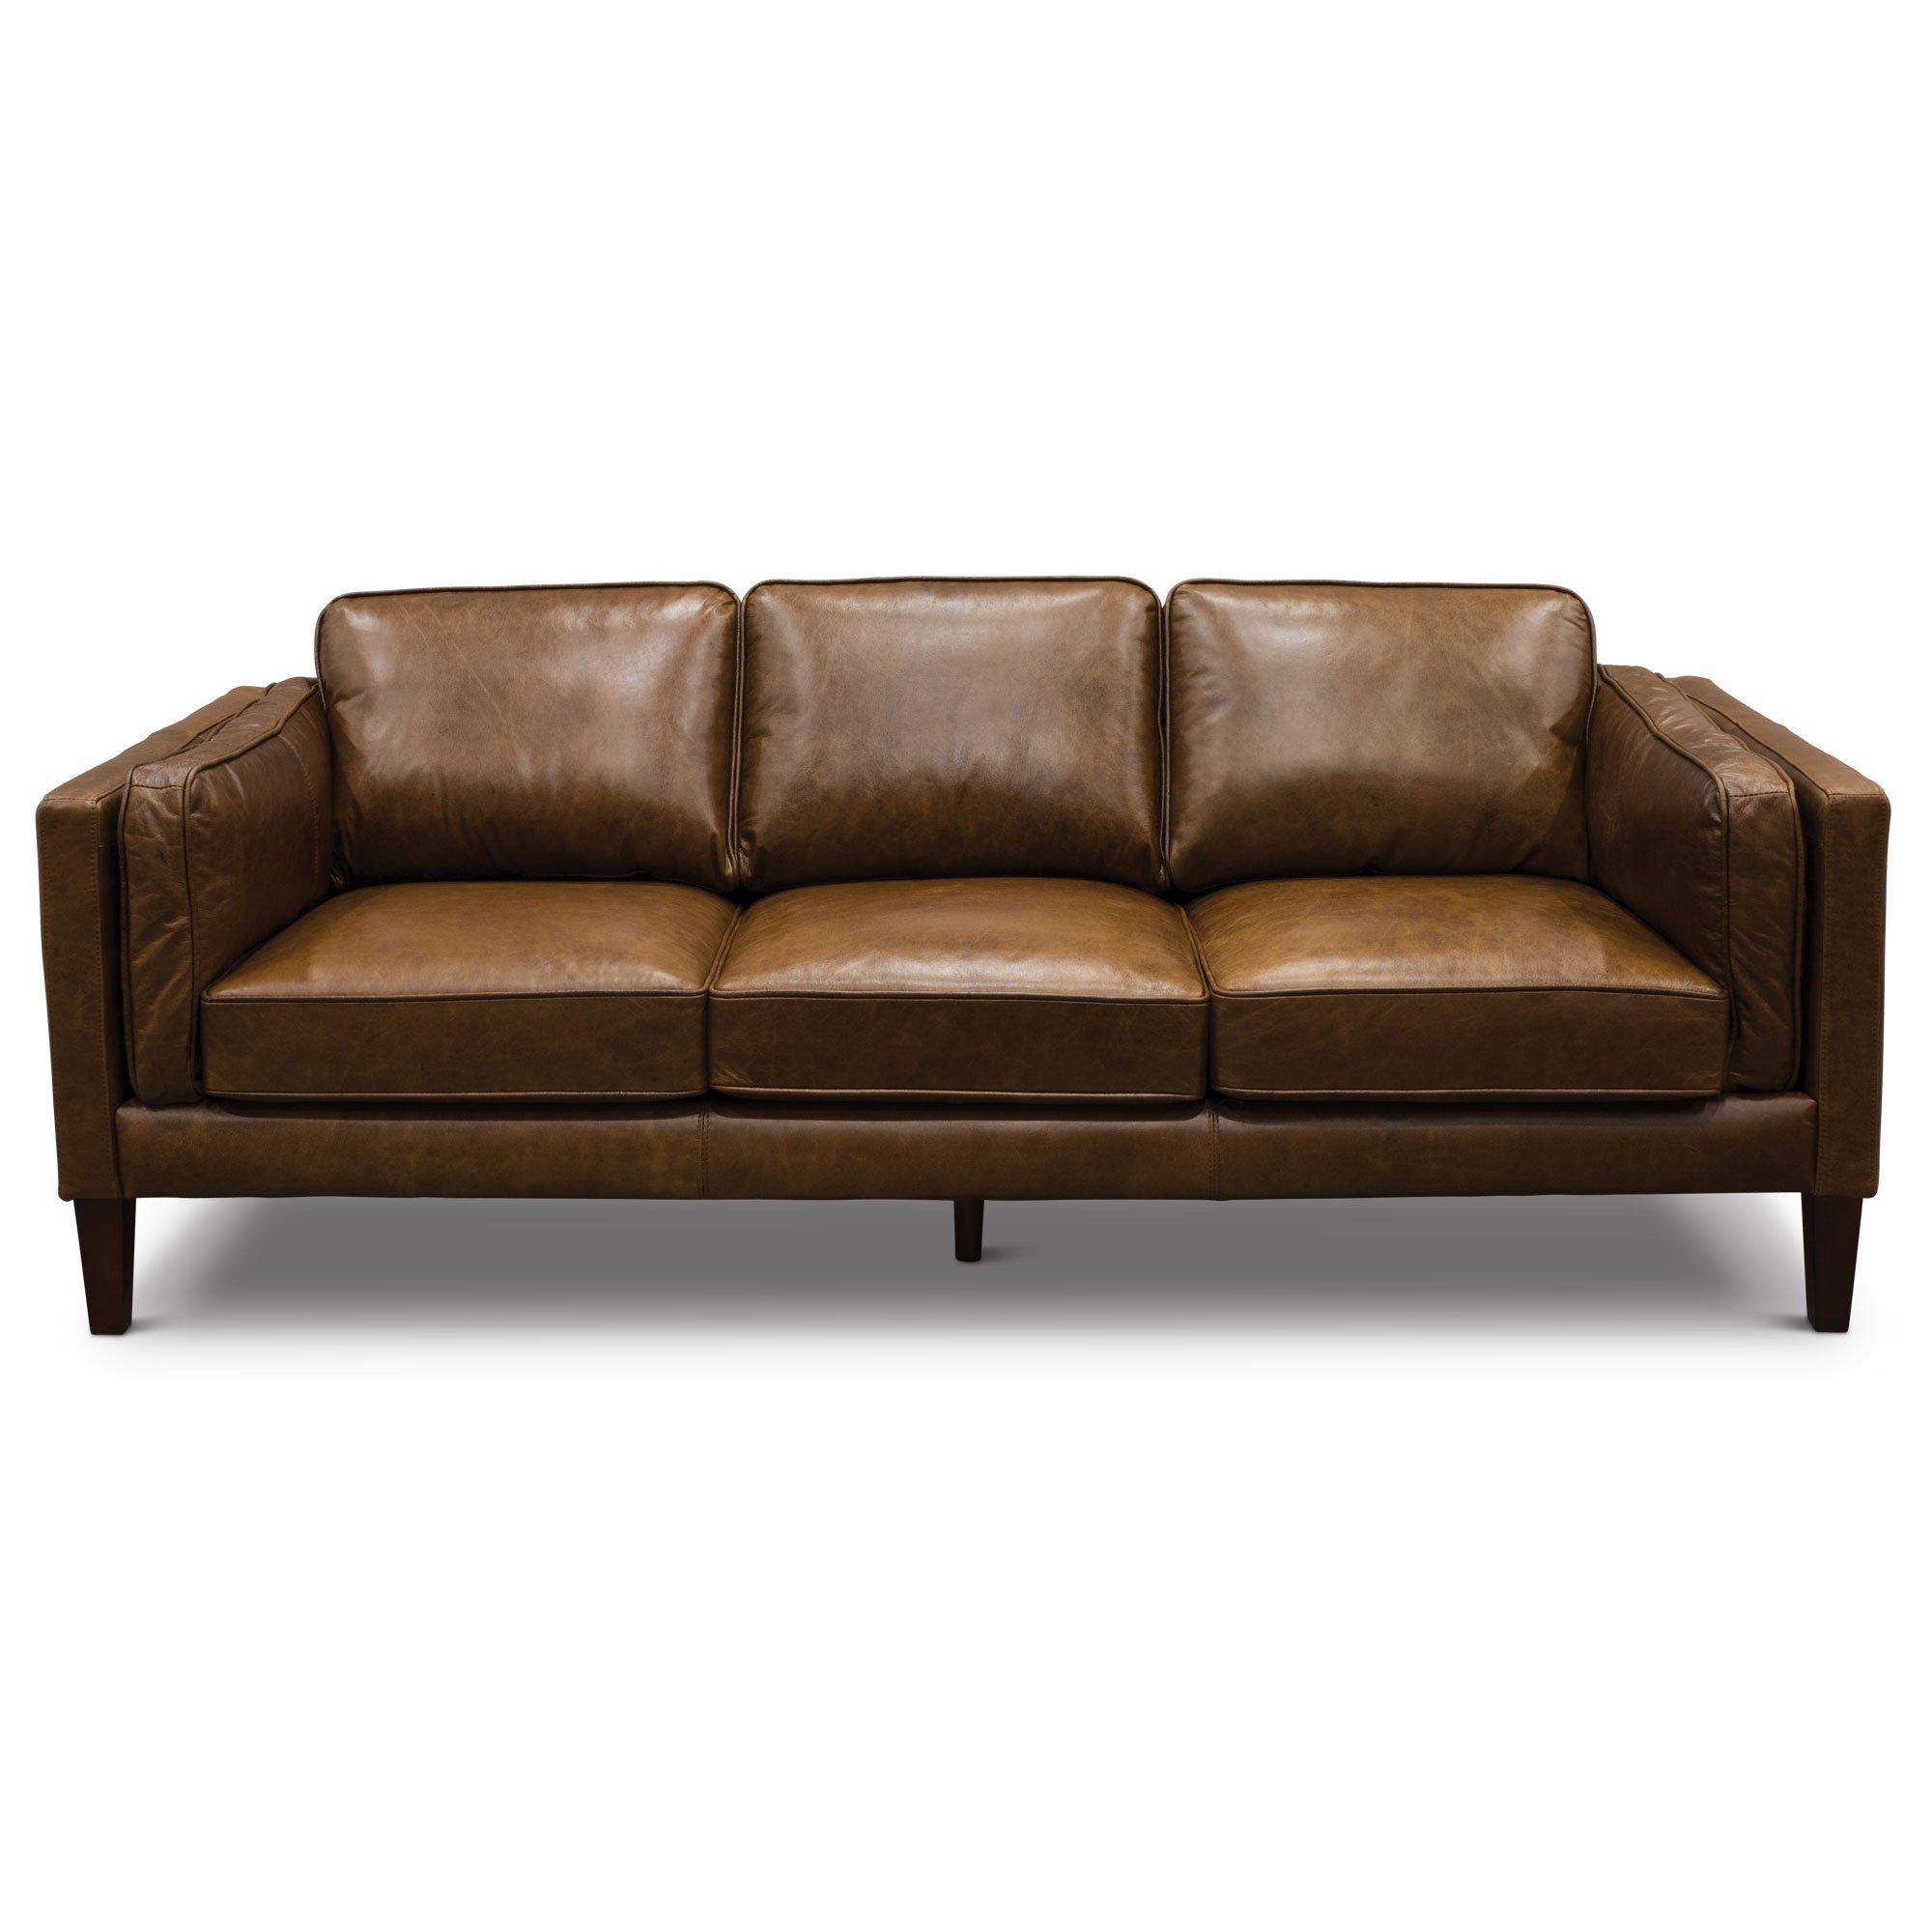 modern classic cocoa brown leather sofa - Brompton |  rc willey furniture ZLEHHDF